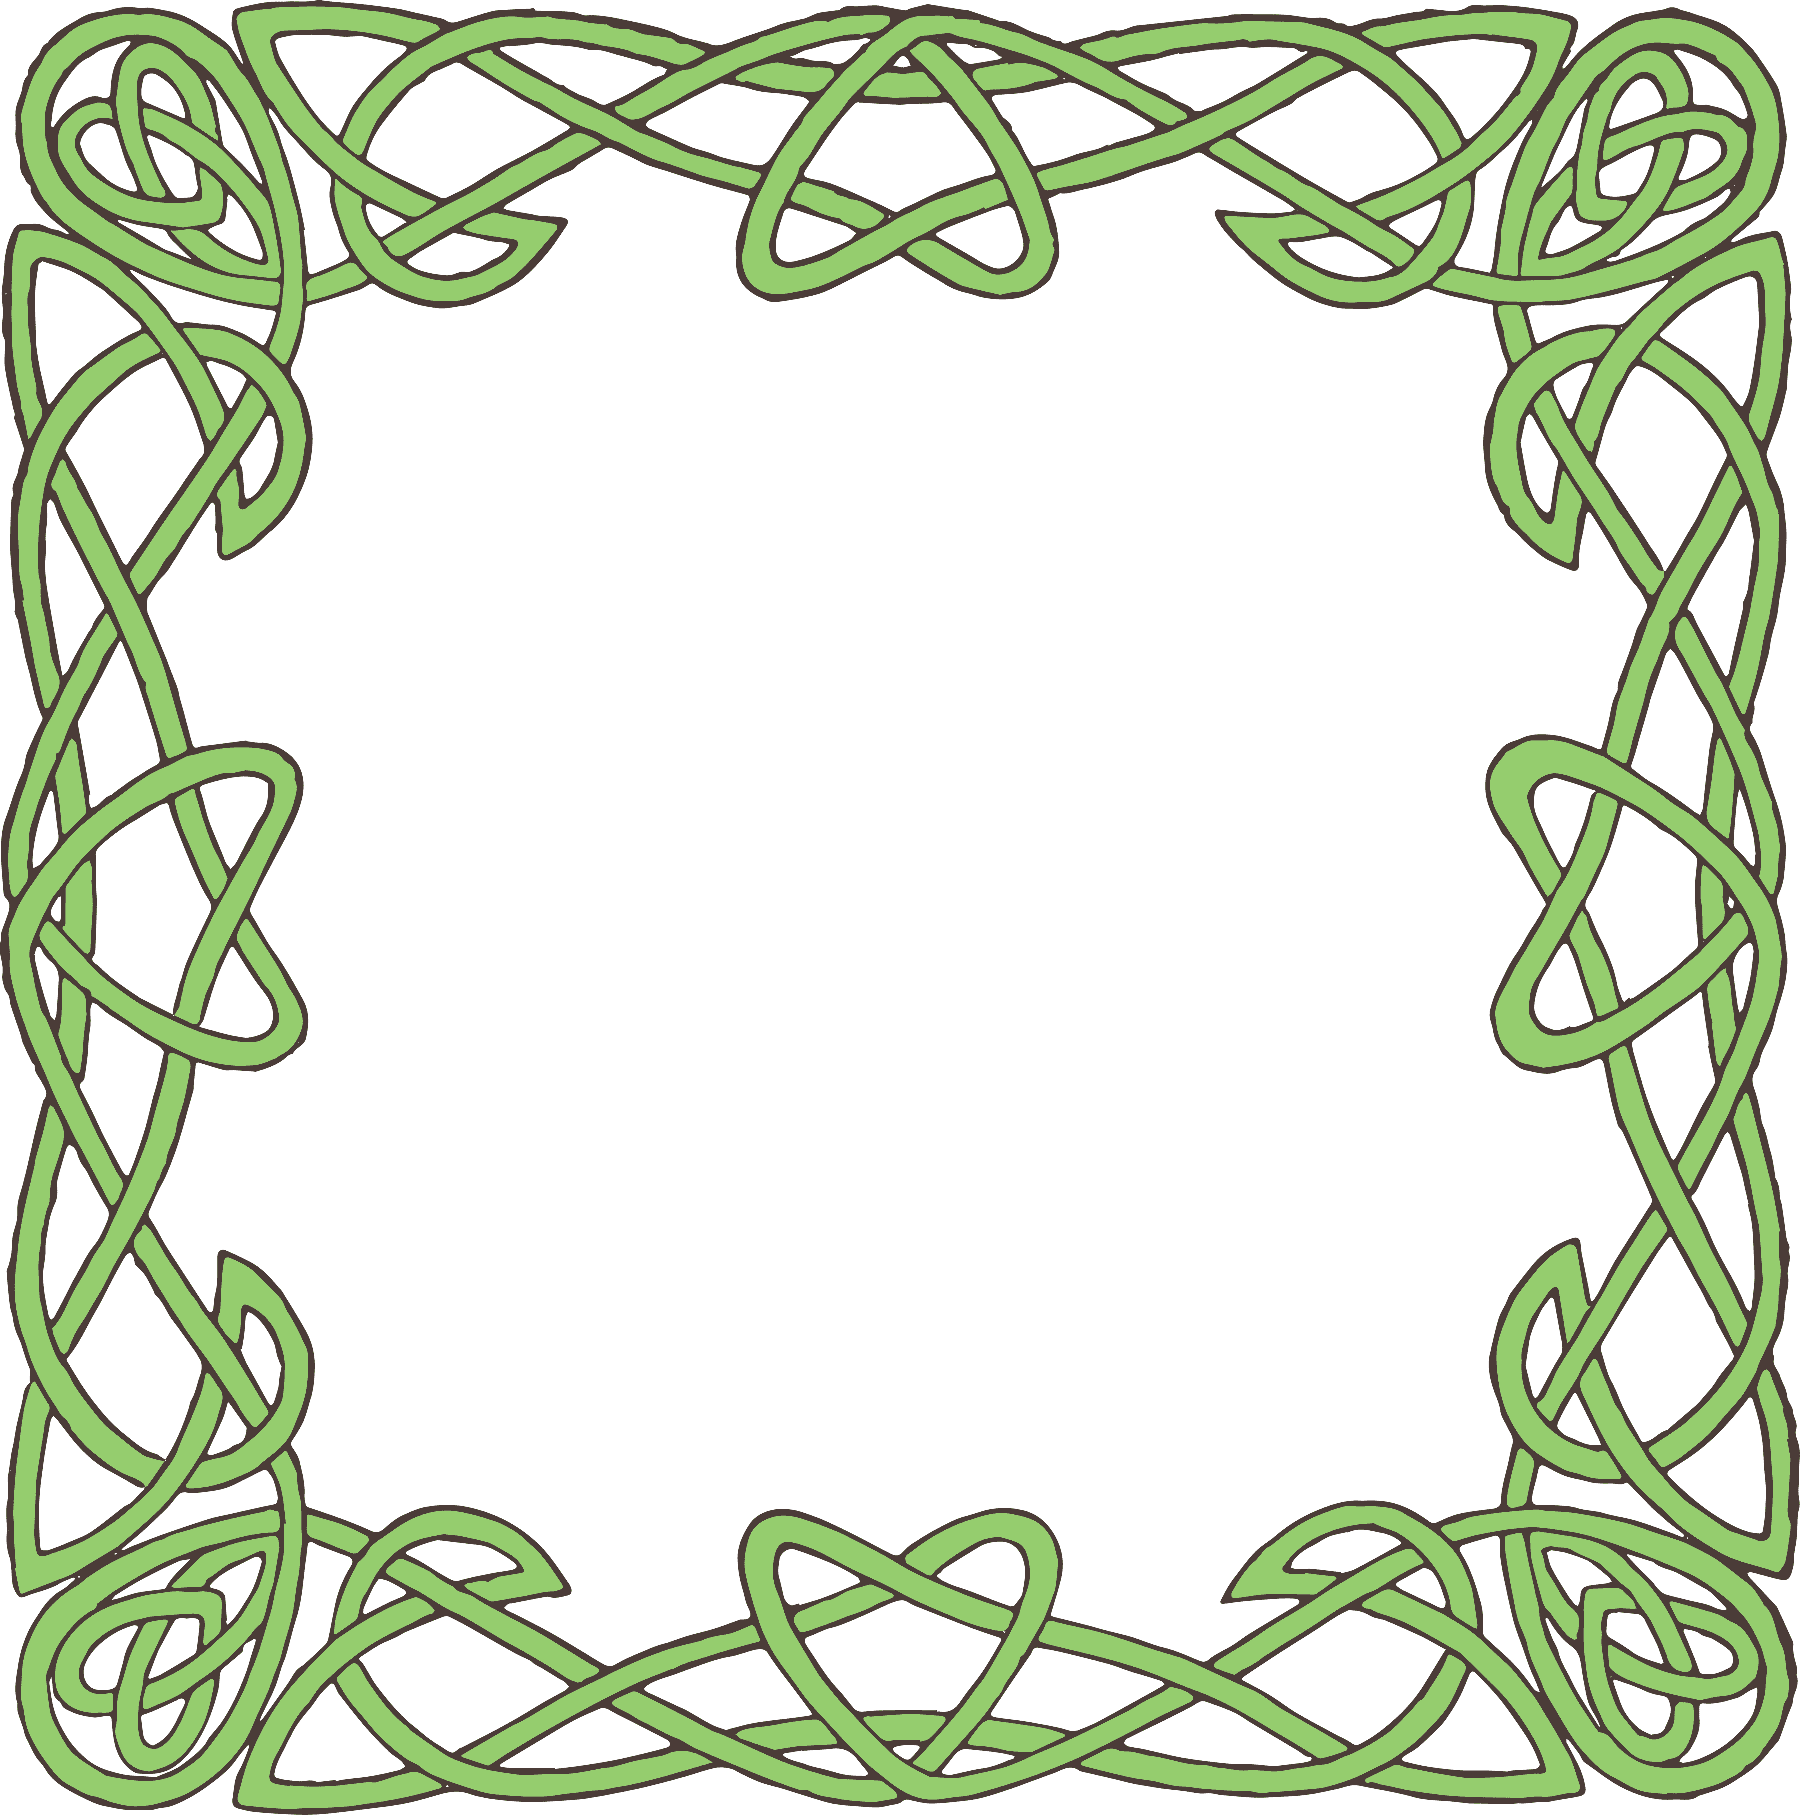 Royalty free images knotwork. Celtic border png